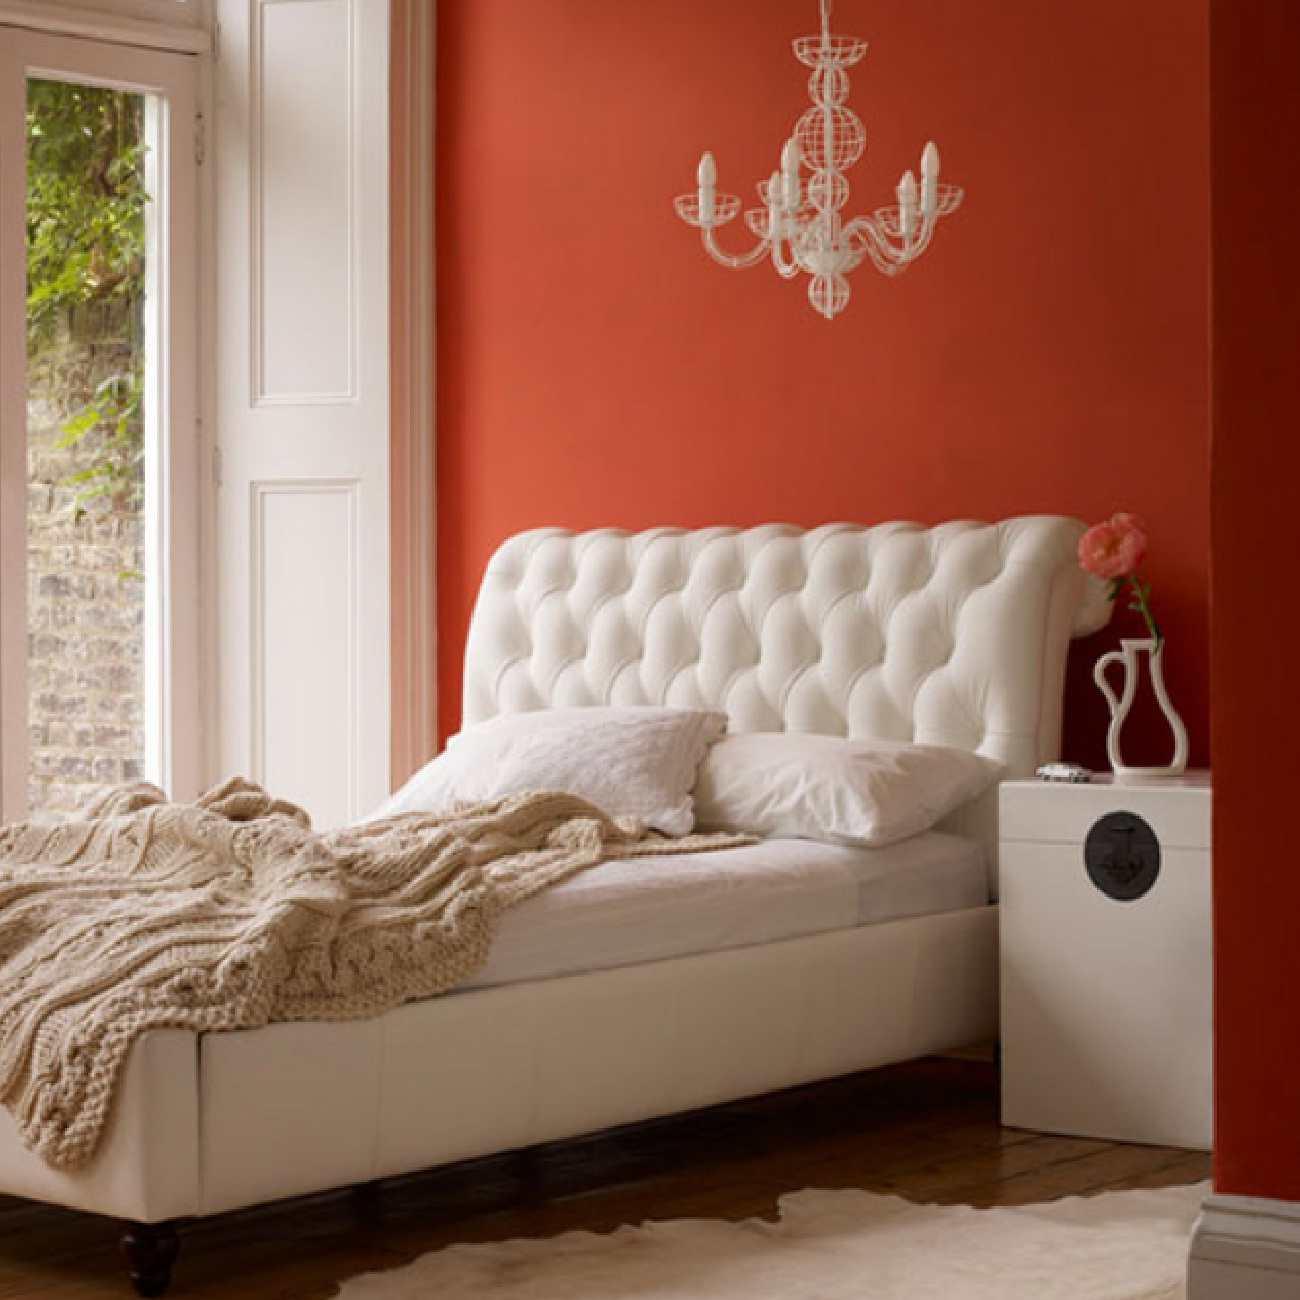 Bedroom-Interior-Design-Ideas Fabulous Orange Bedroom Decorating Ideas and Designs